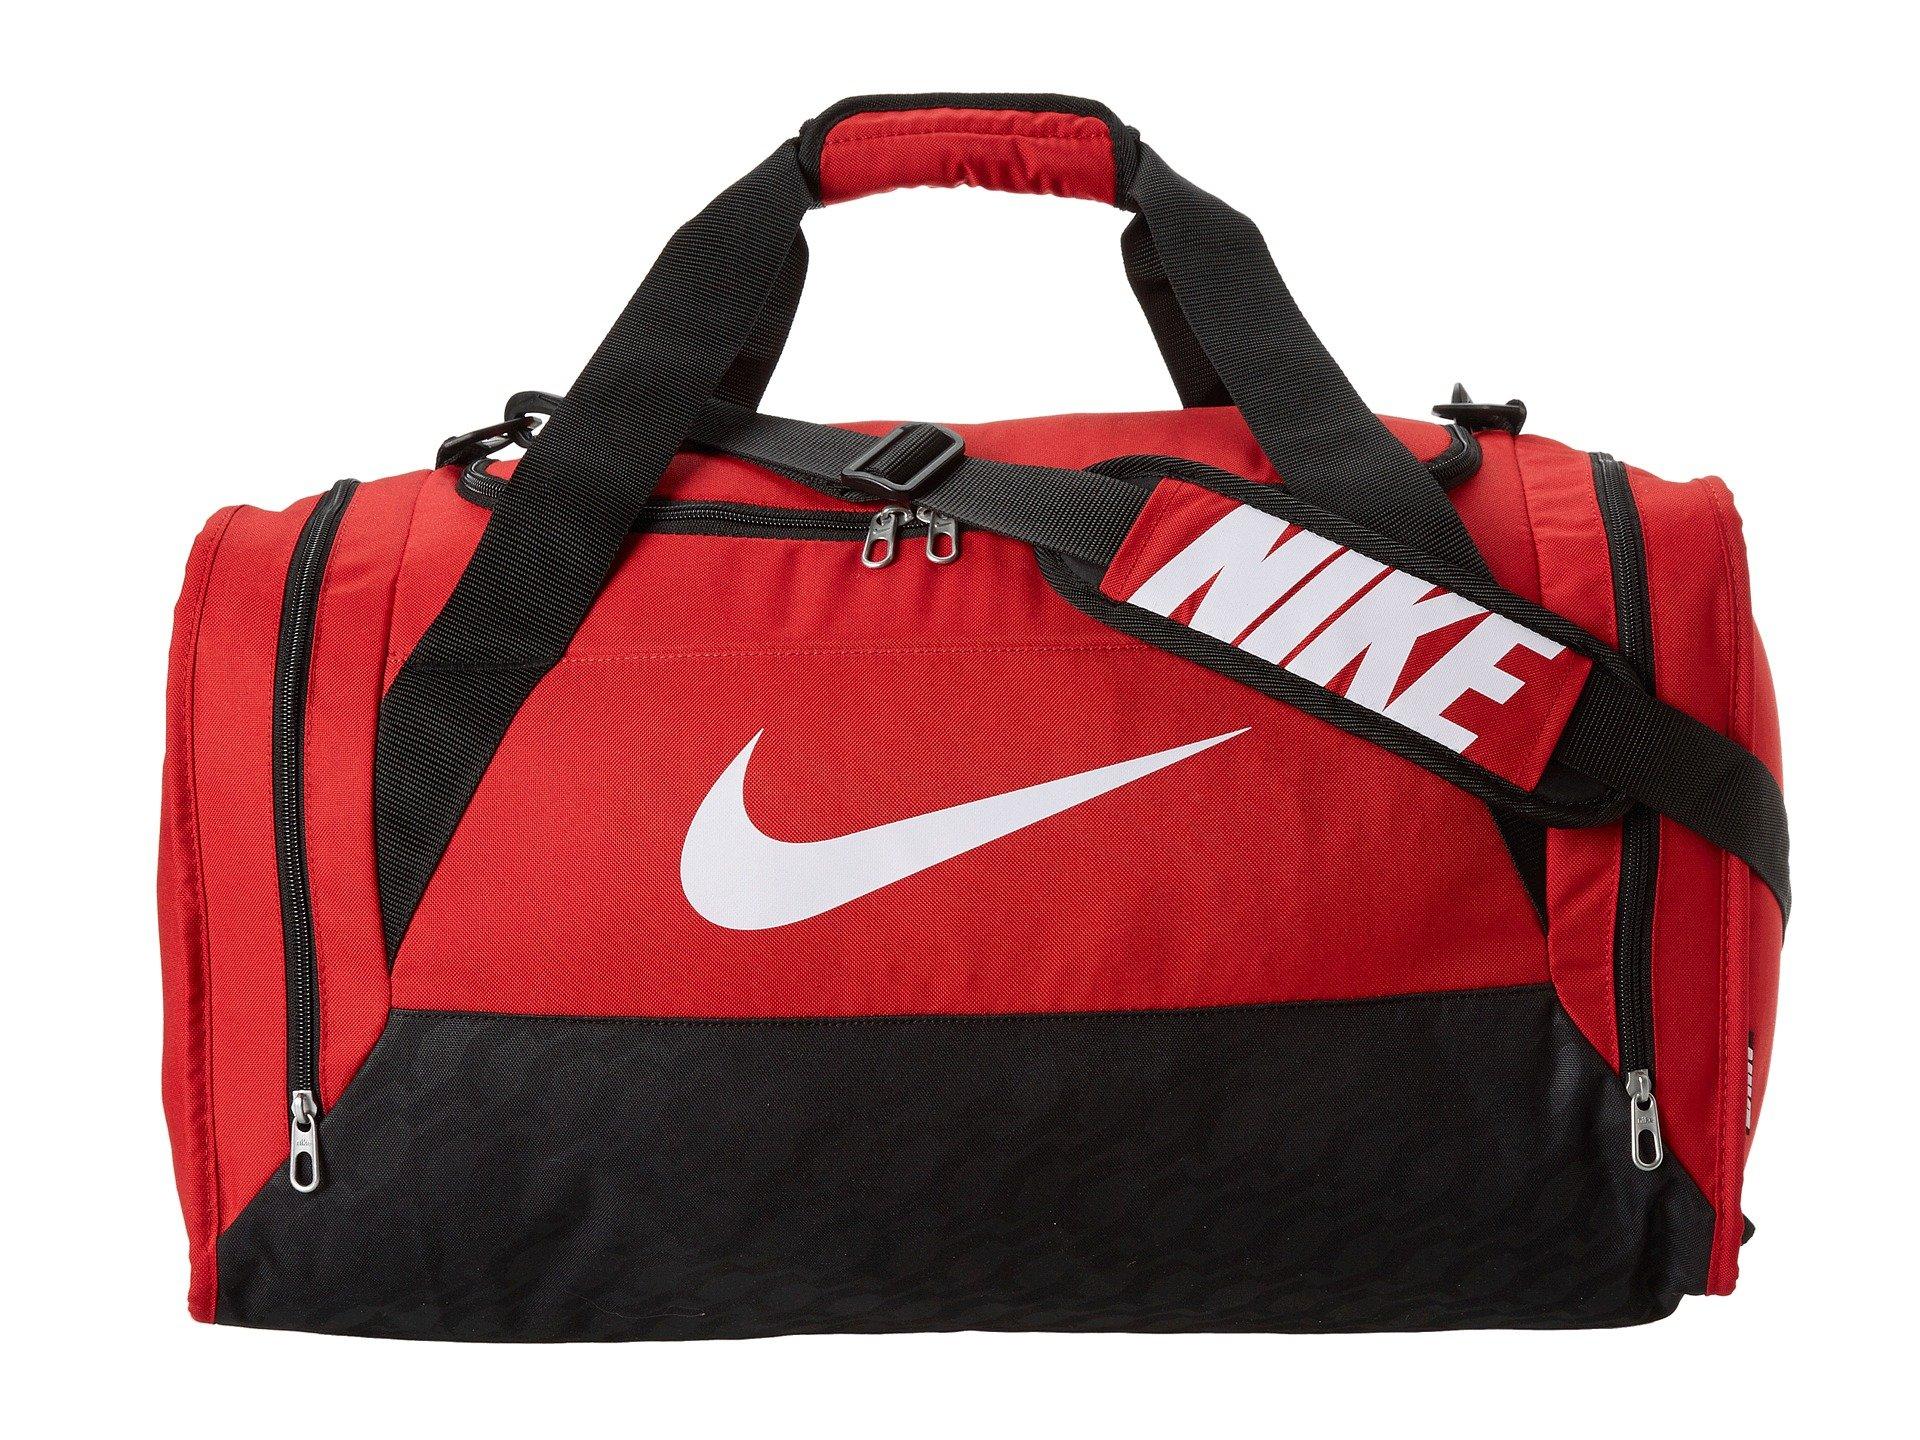 48cc4993c2 Lyst - Nike Brasilia 6 Medium Duffel in Red